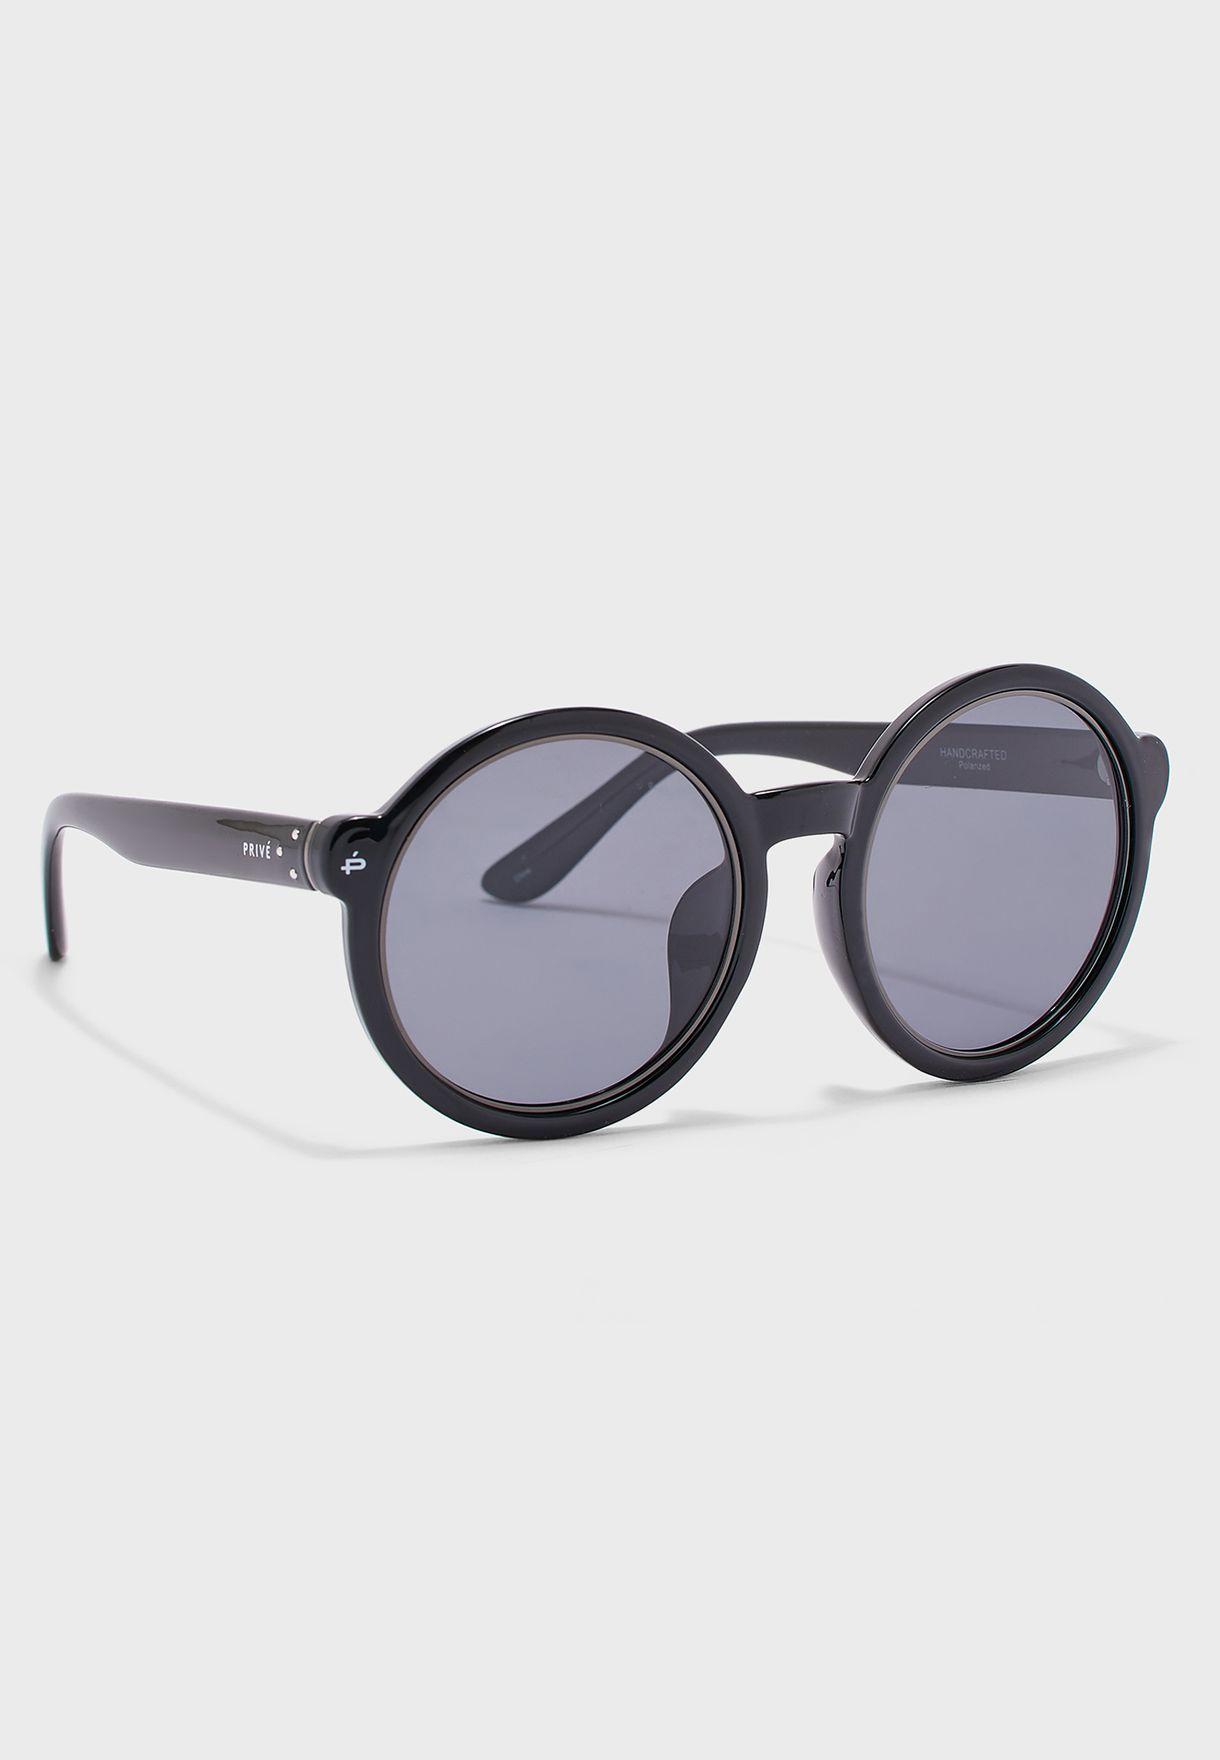 The Boss Round Polarized Sunglasses